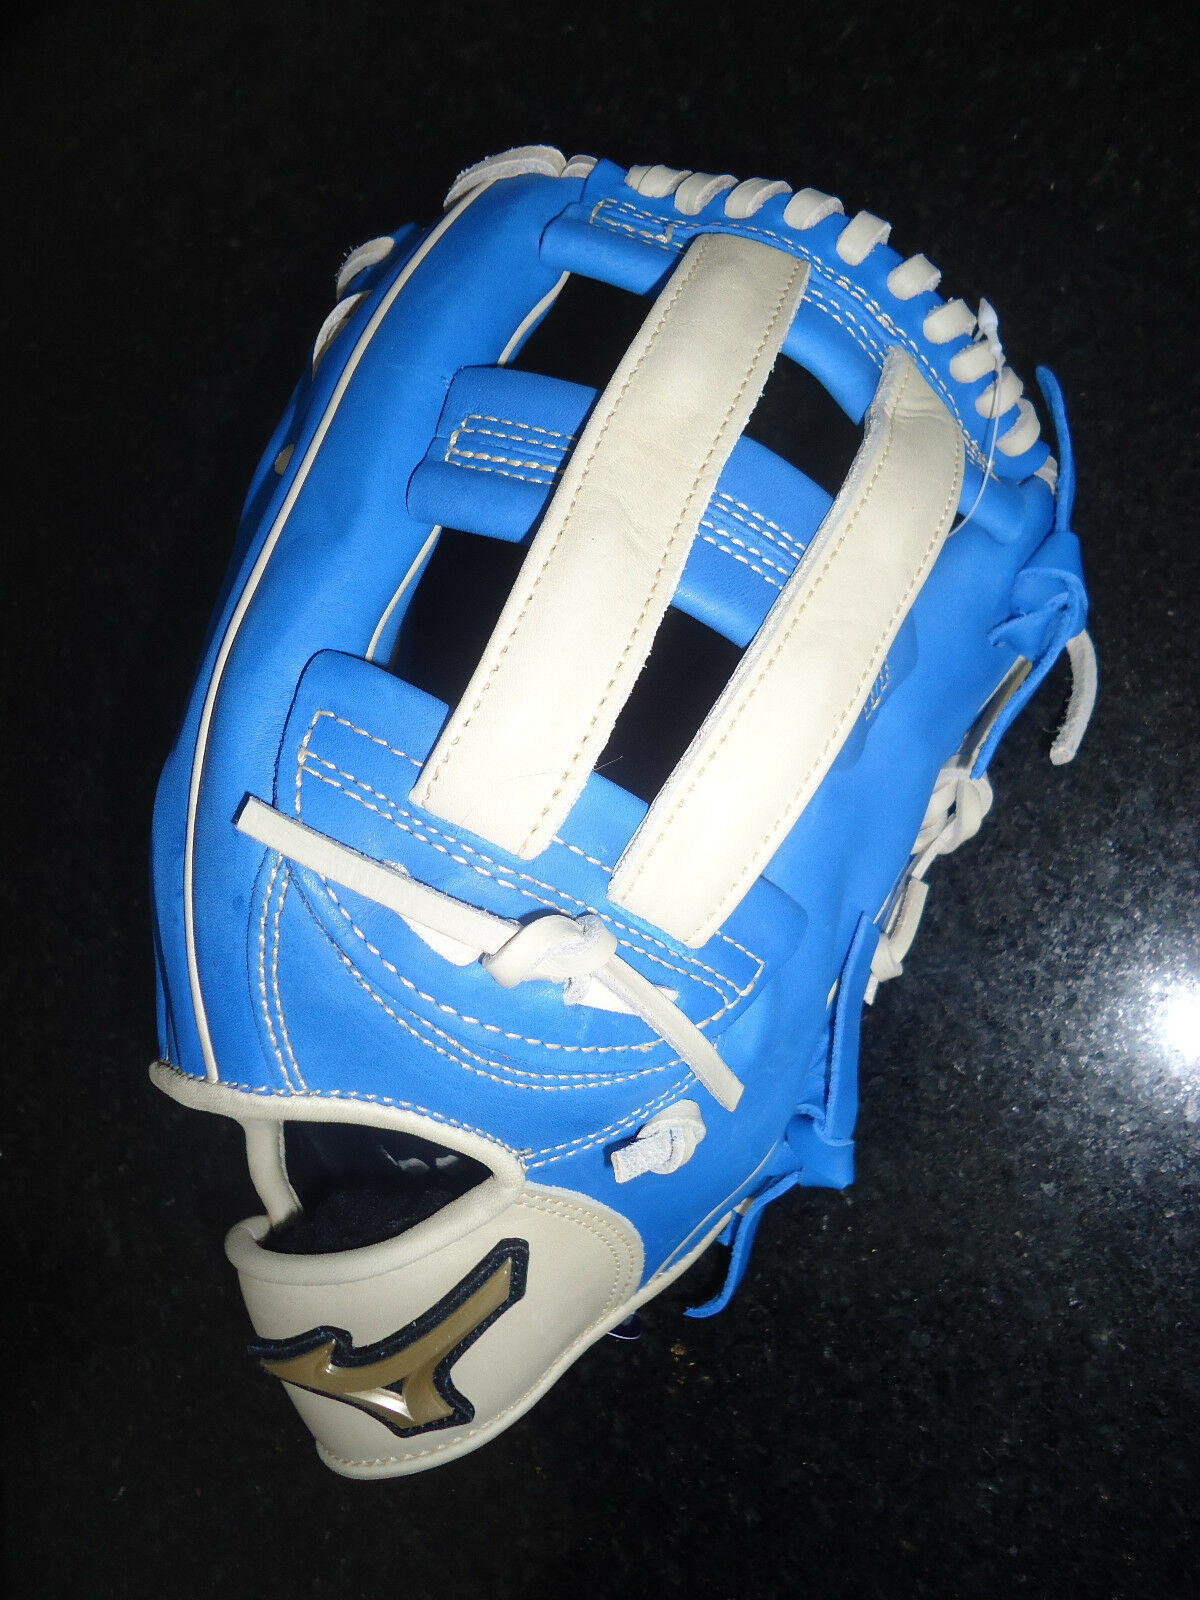 Guante de béisbol de Mizuno Global Elite GGE73 12.75  RH -  249.99